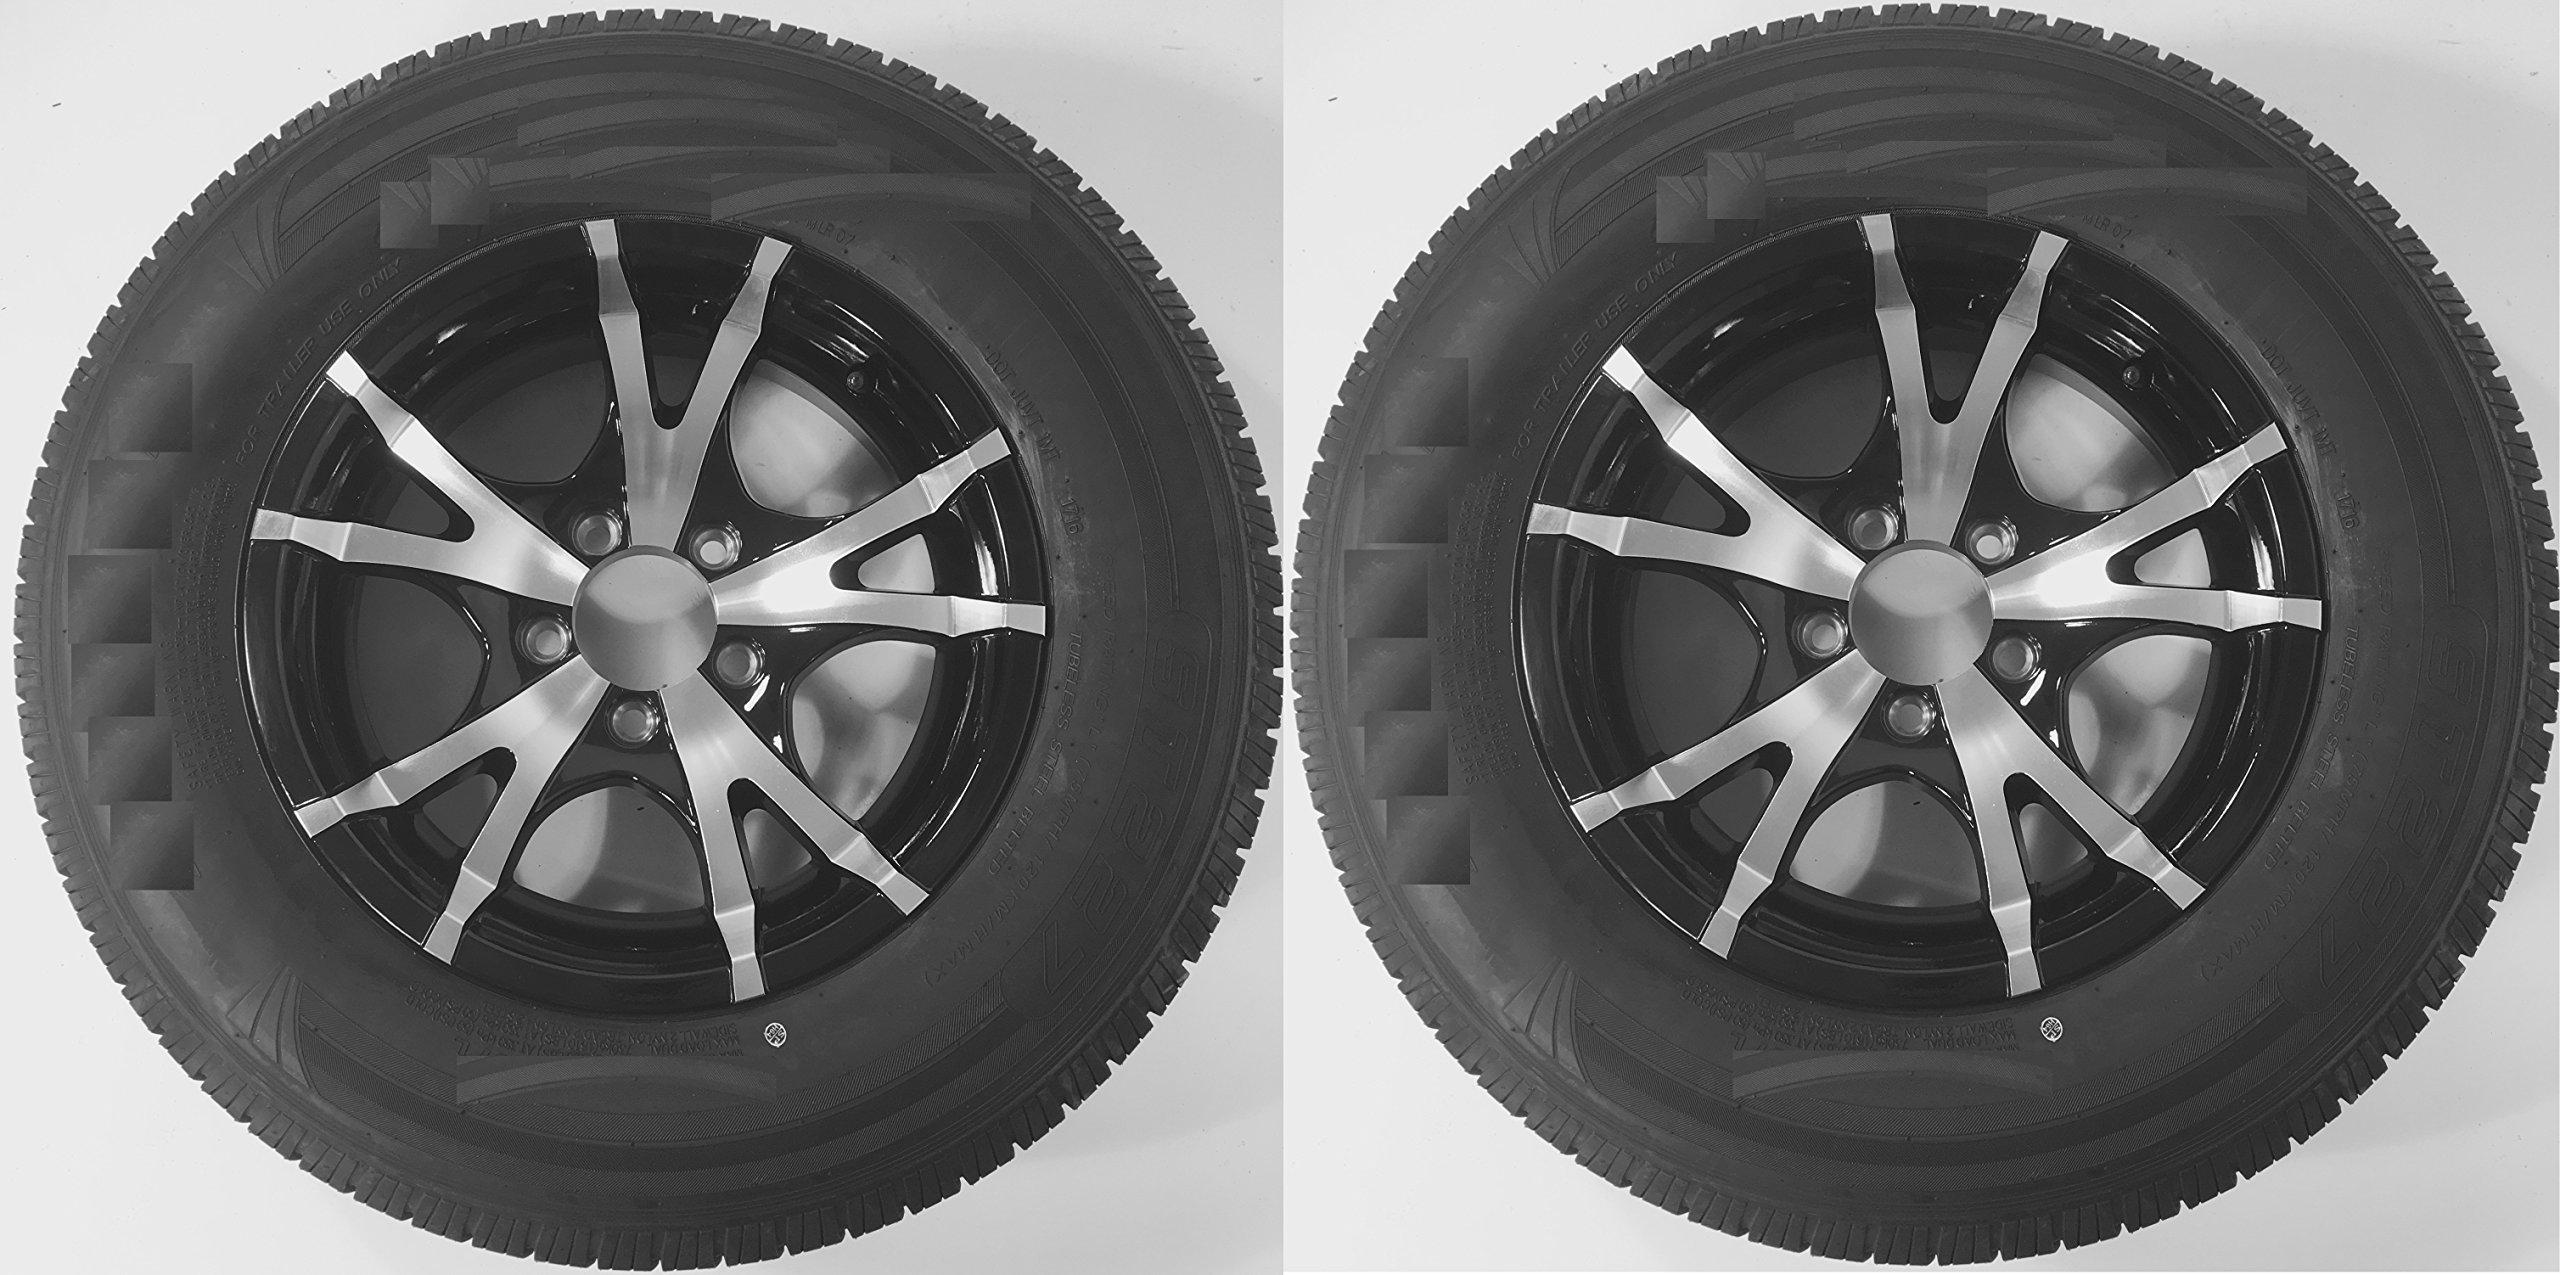 2-Pack Radial Trailer Tire & Rim ST175/80R13 Load C 5 Lug Aluminum T07 Black